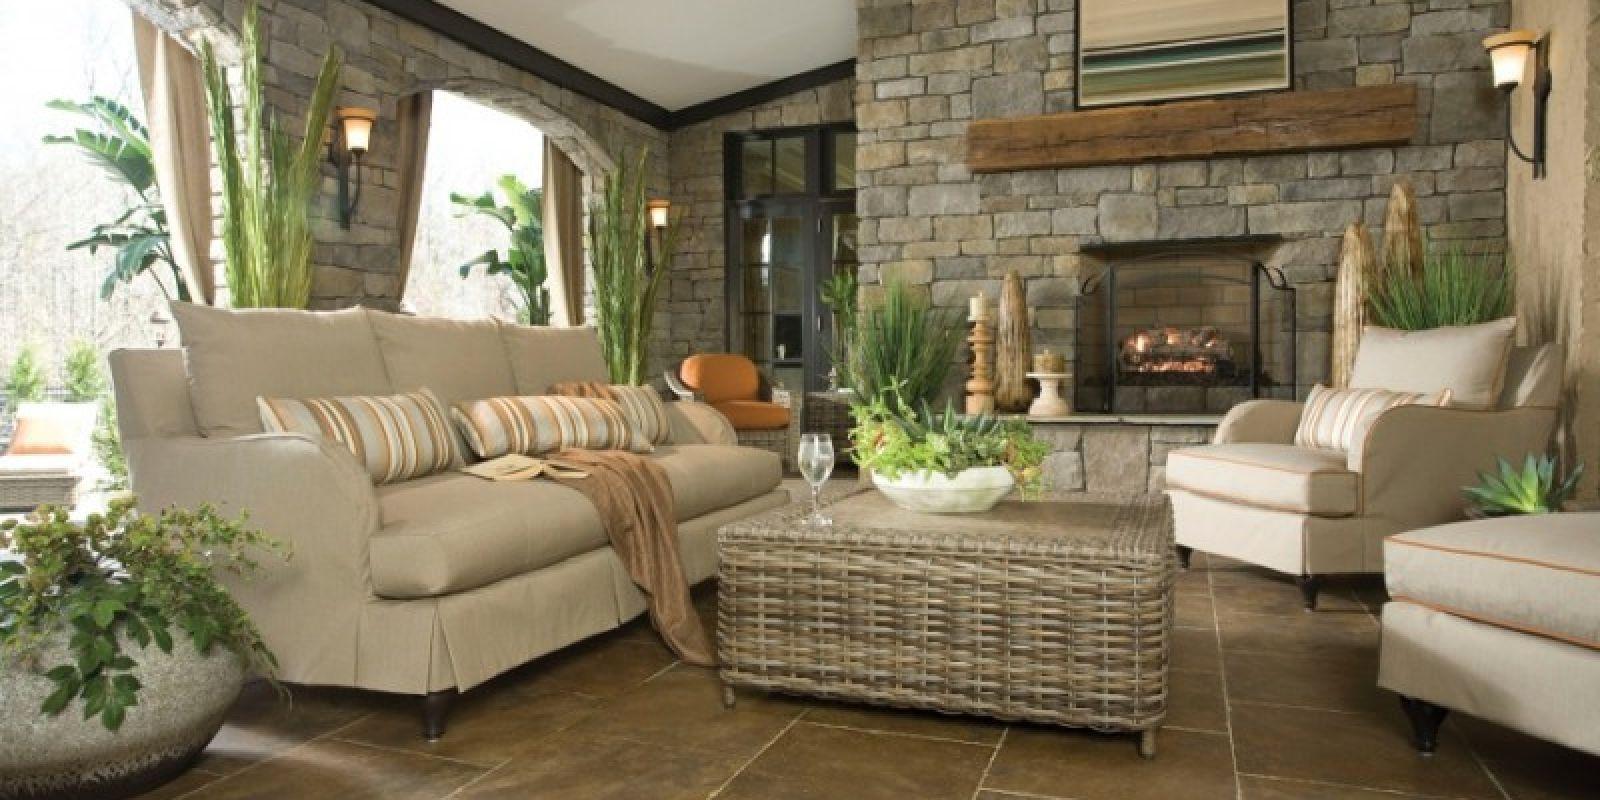 outdoor living furniture outdoor upholstered UKDTJWX